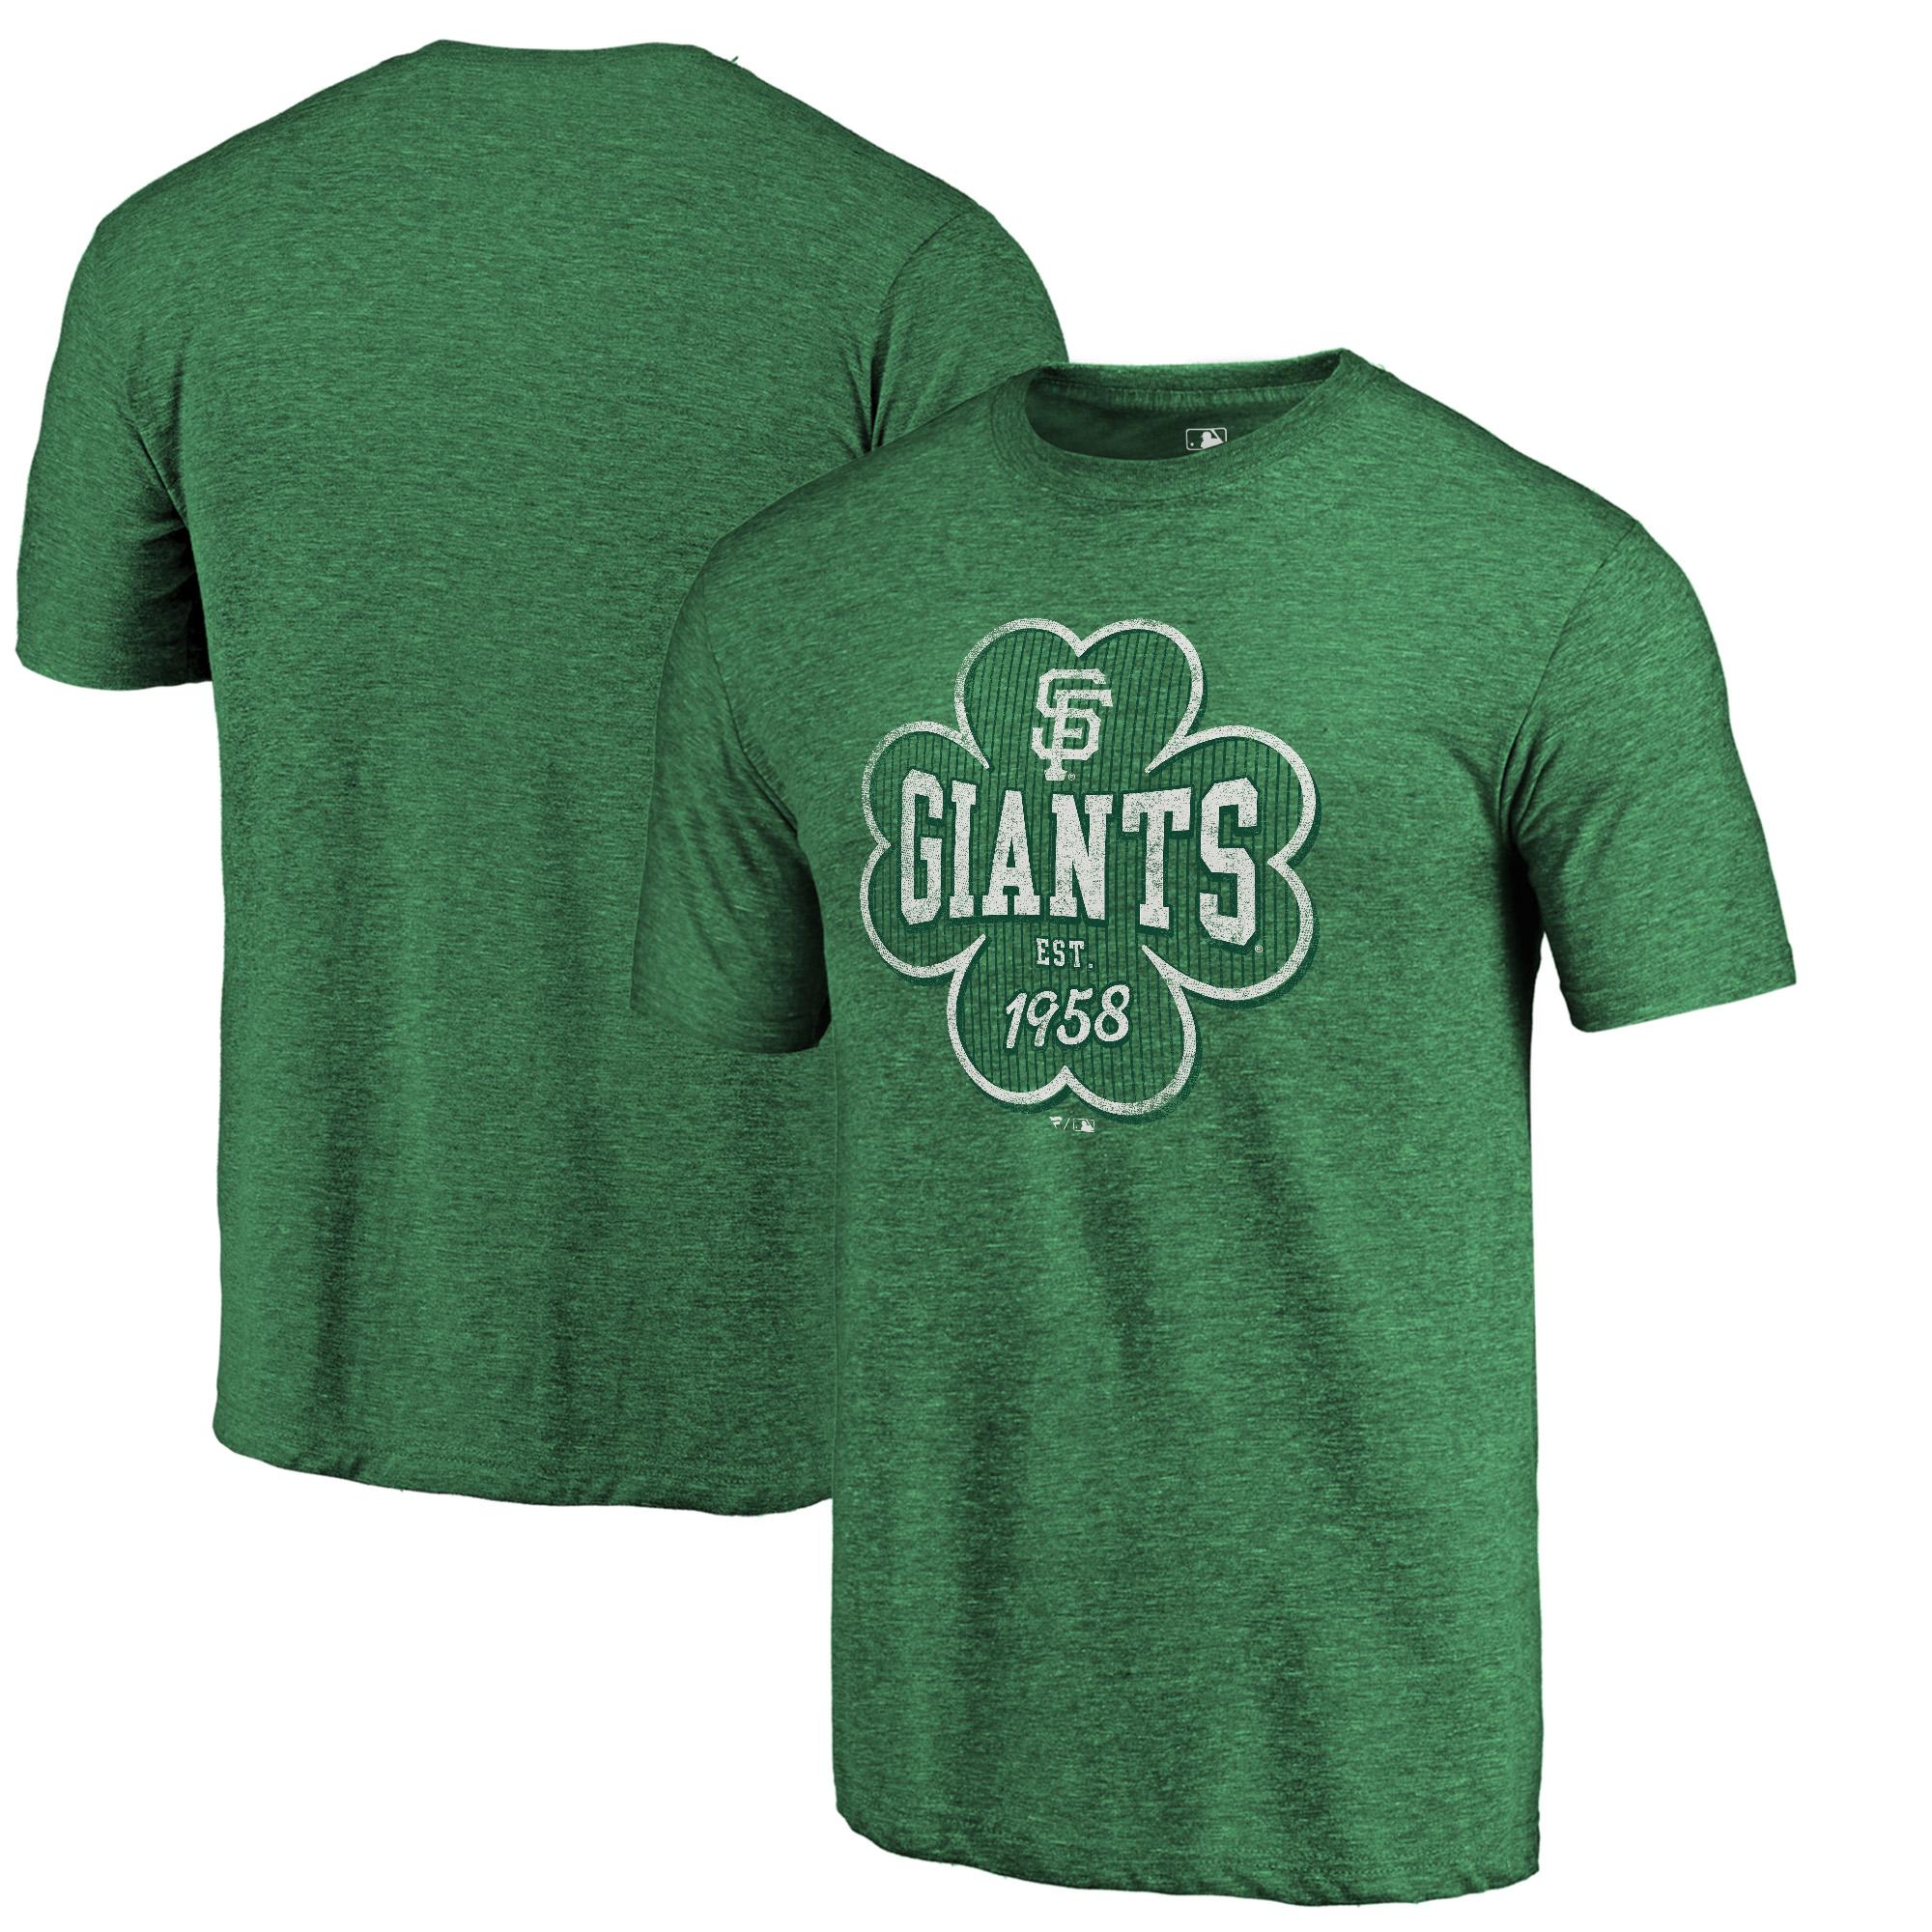 Men's Fanatics Branded Kelly Green San Francisco Giants 2018 St. Patrick's Day Emerald Isle Tri-Blend T-Shirt